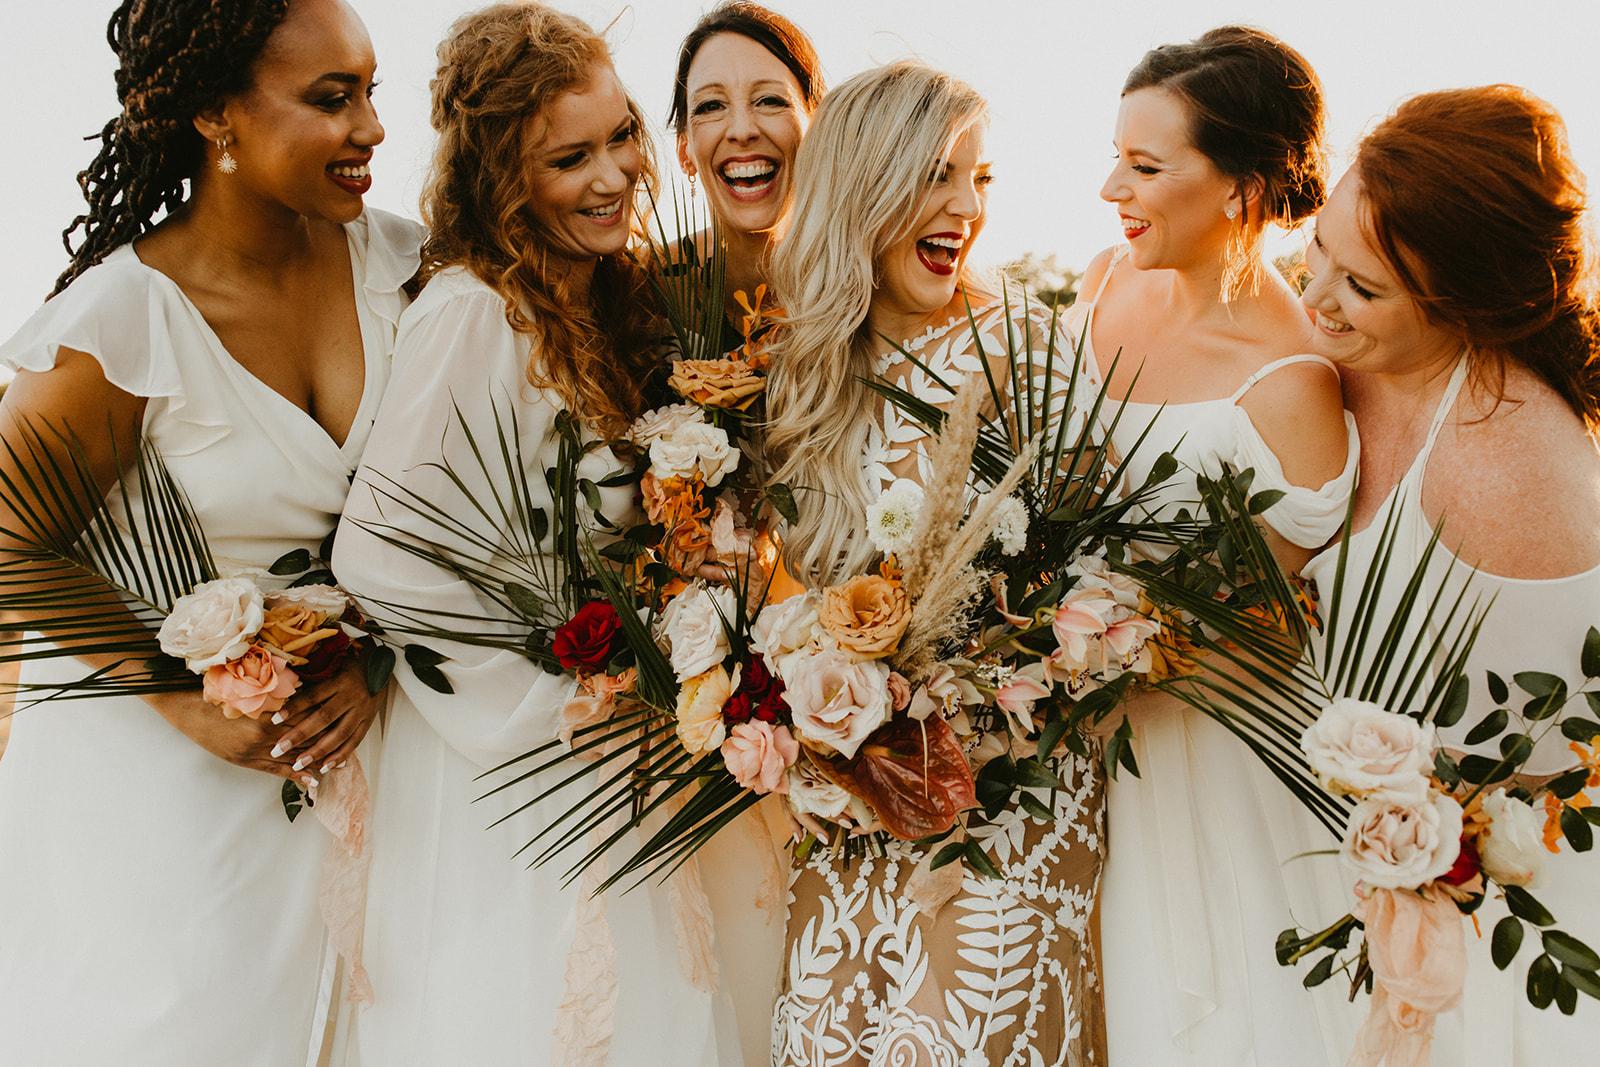 Tropical Colorful Frond Bridesmaid + Bride Bouquets + White Creamy Bridesmaid Dresses + Rue De Seine Wedding Dress + Boho Wedding + Wedding Designer Planner Epoch Co+ + Palm Springs + Telluride Durango Colorado Wedding Photographer Century Tree